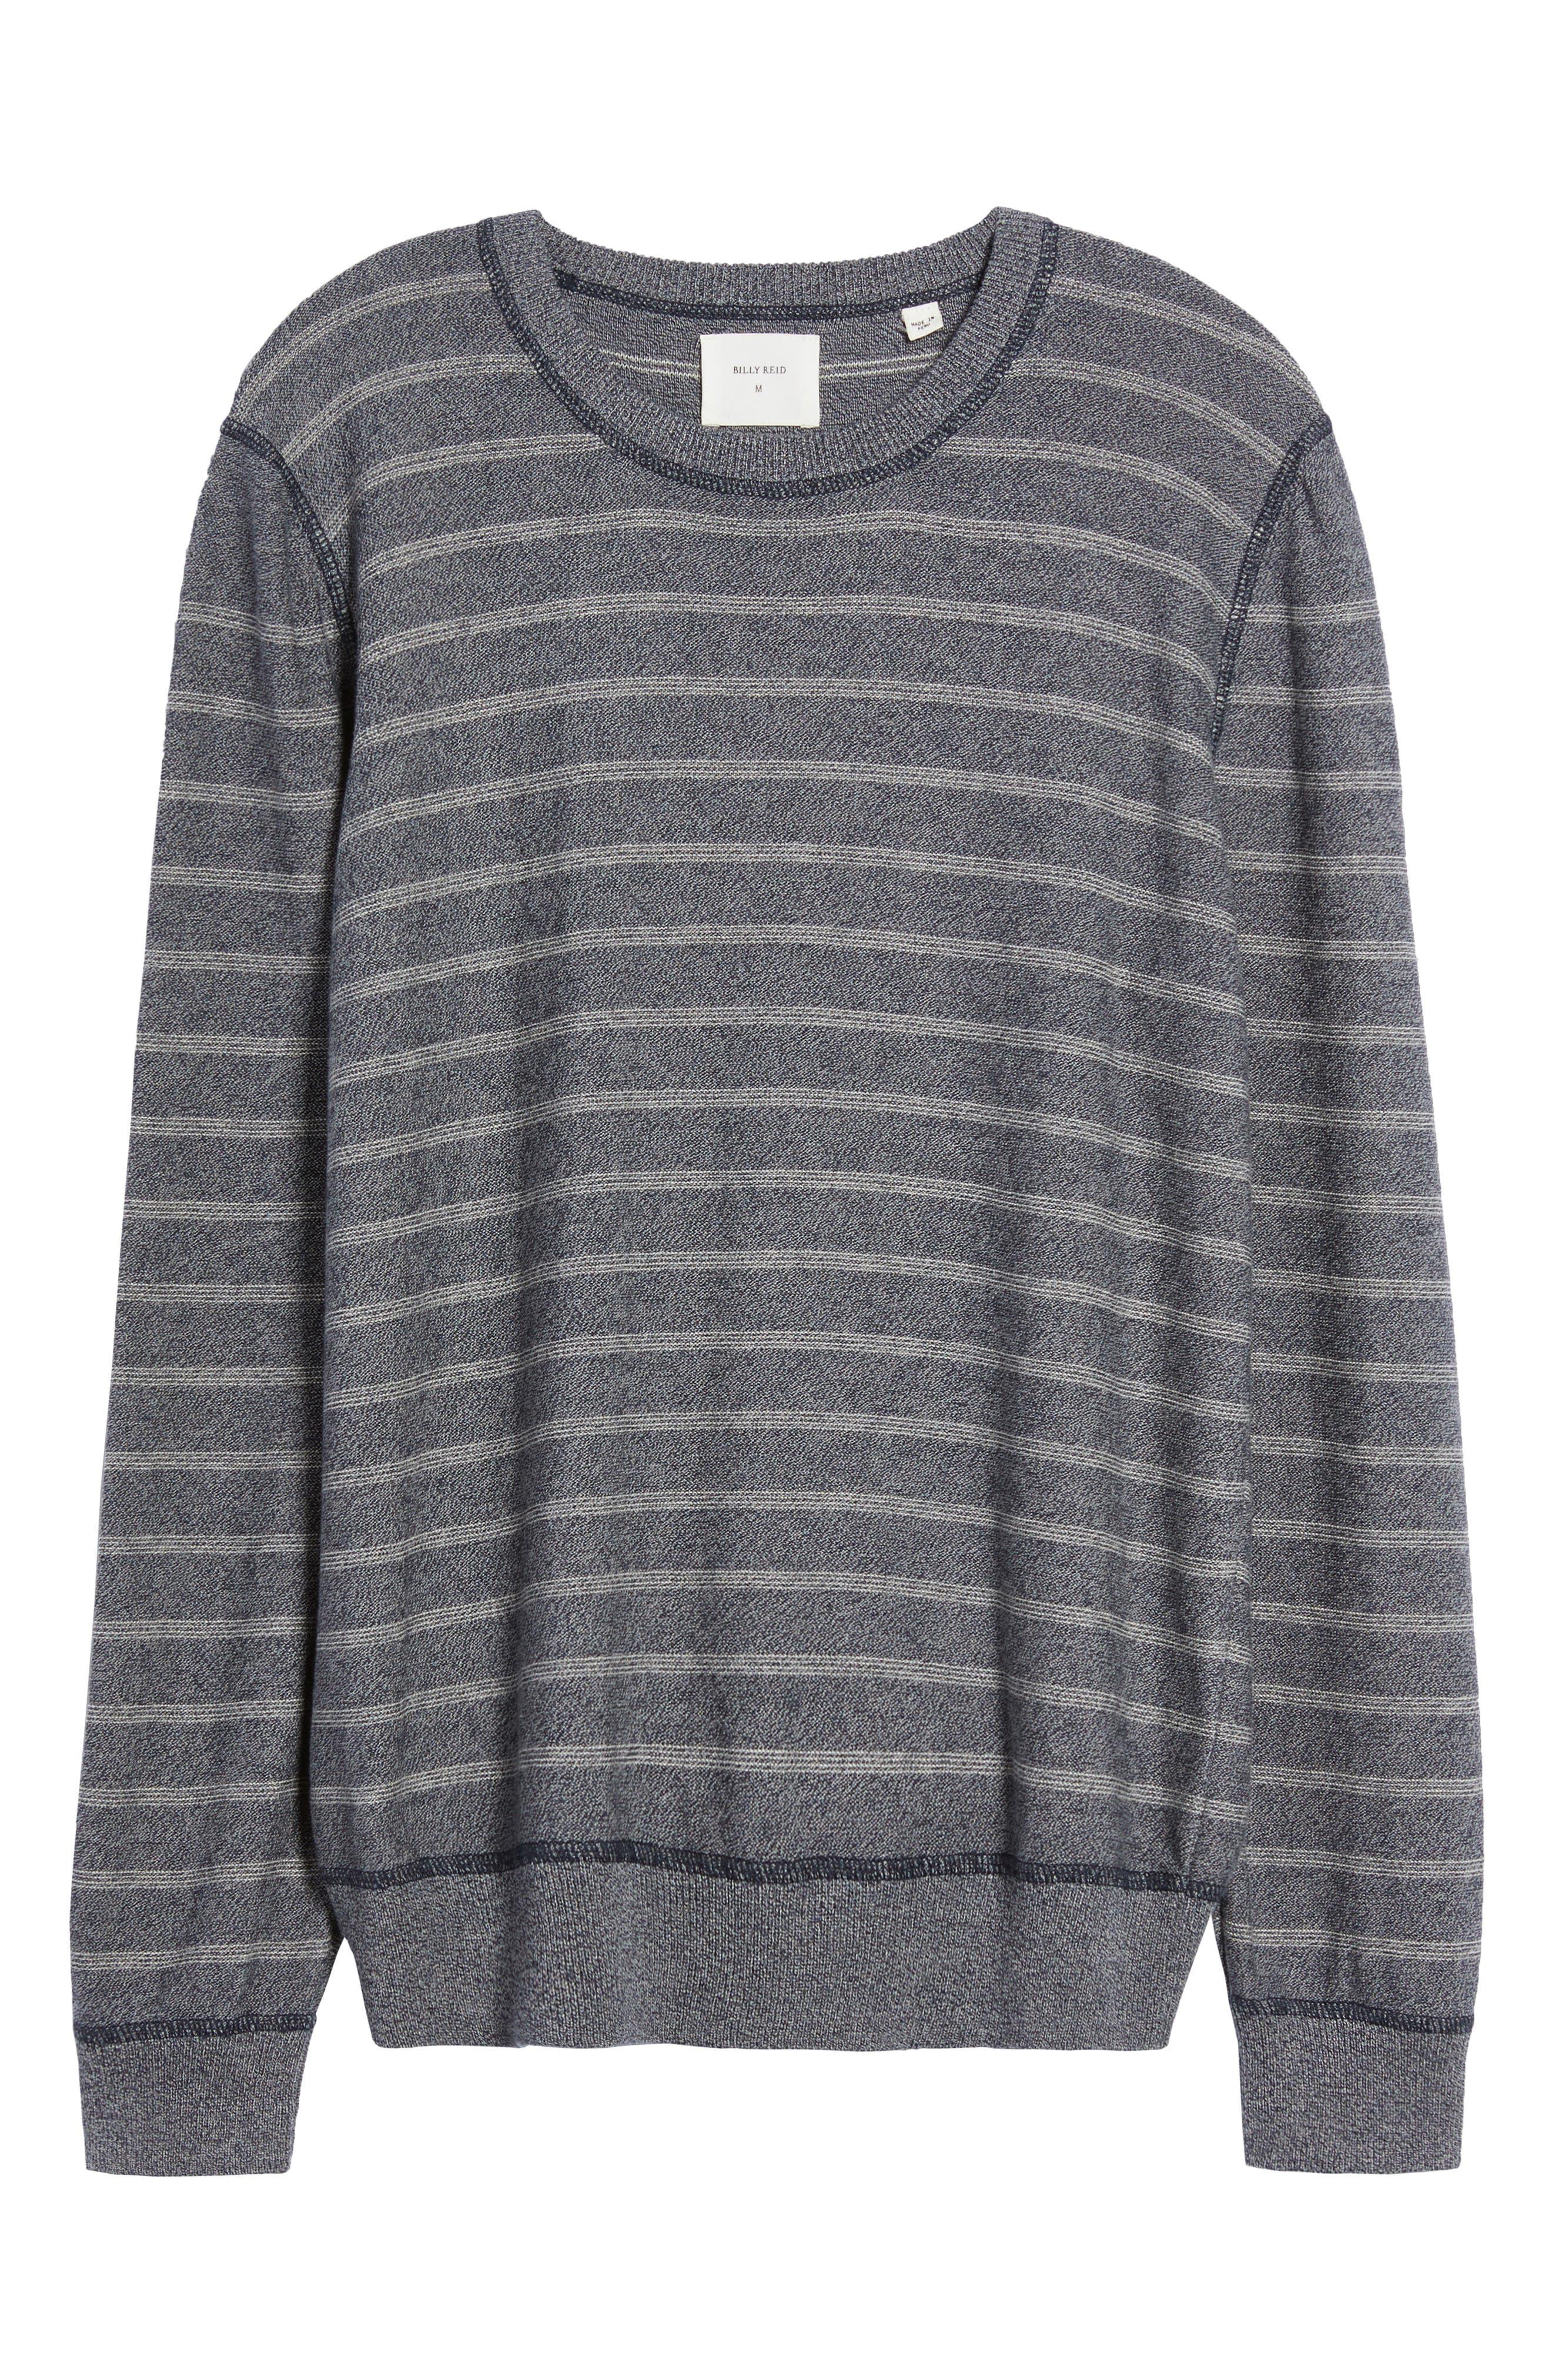 Tanner Crewneck Sweatshirt,                             Alternate thumbnail 6, color,                             021